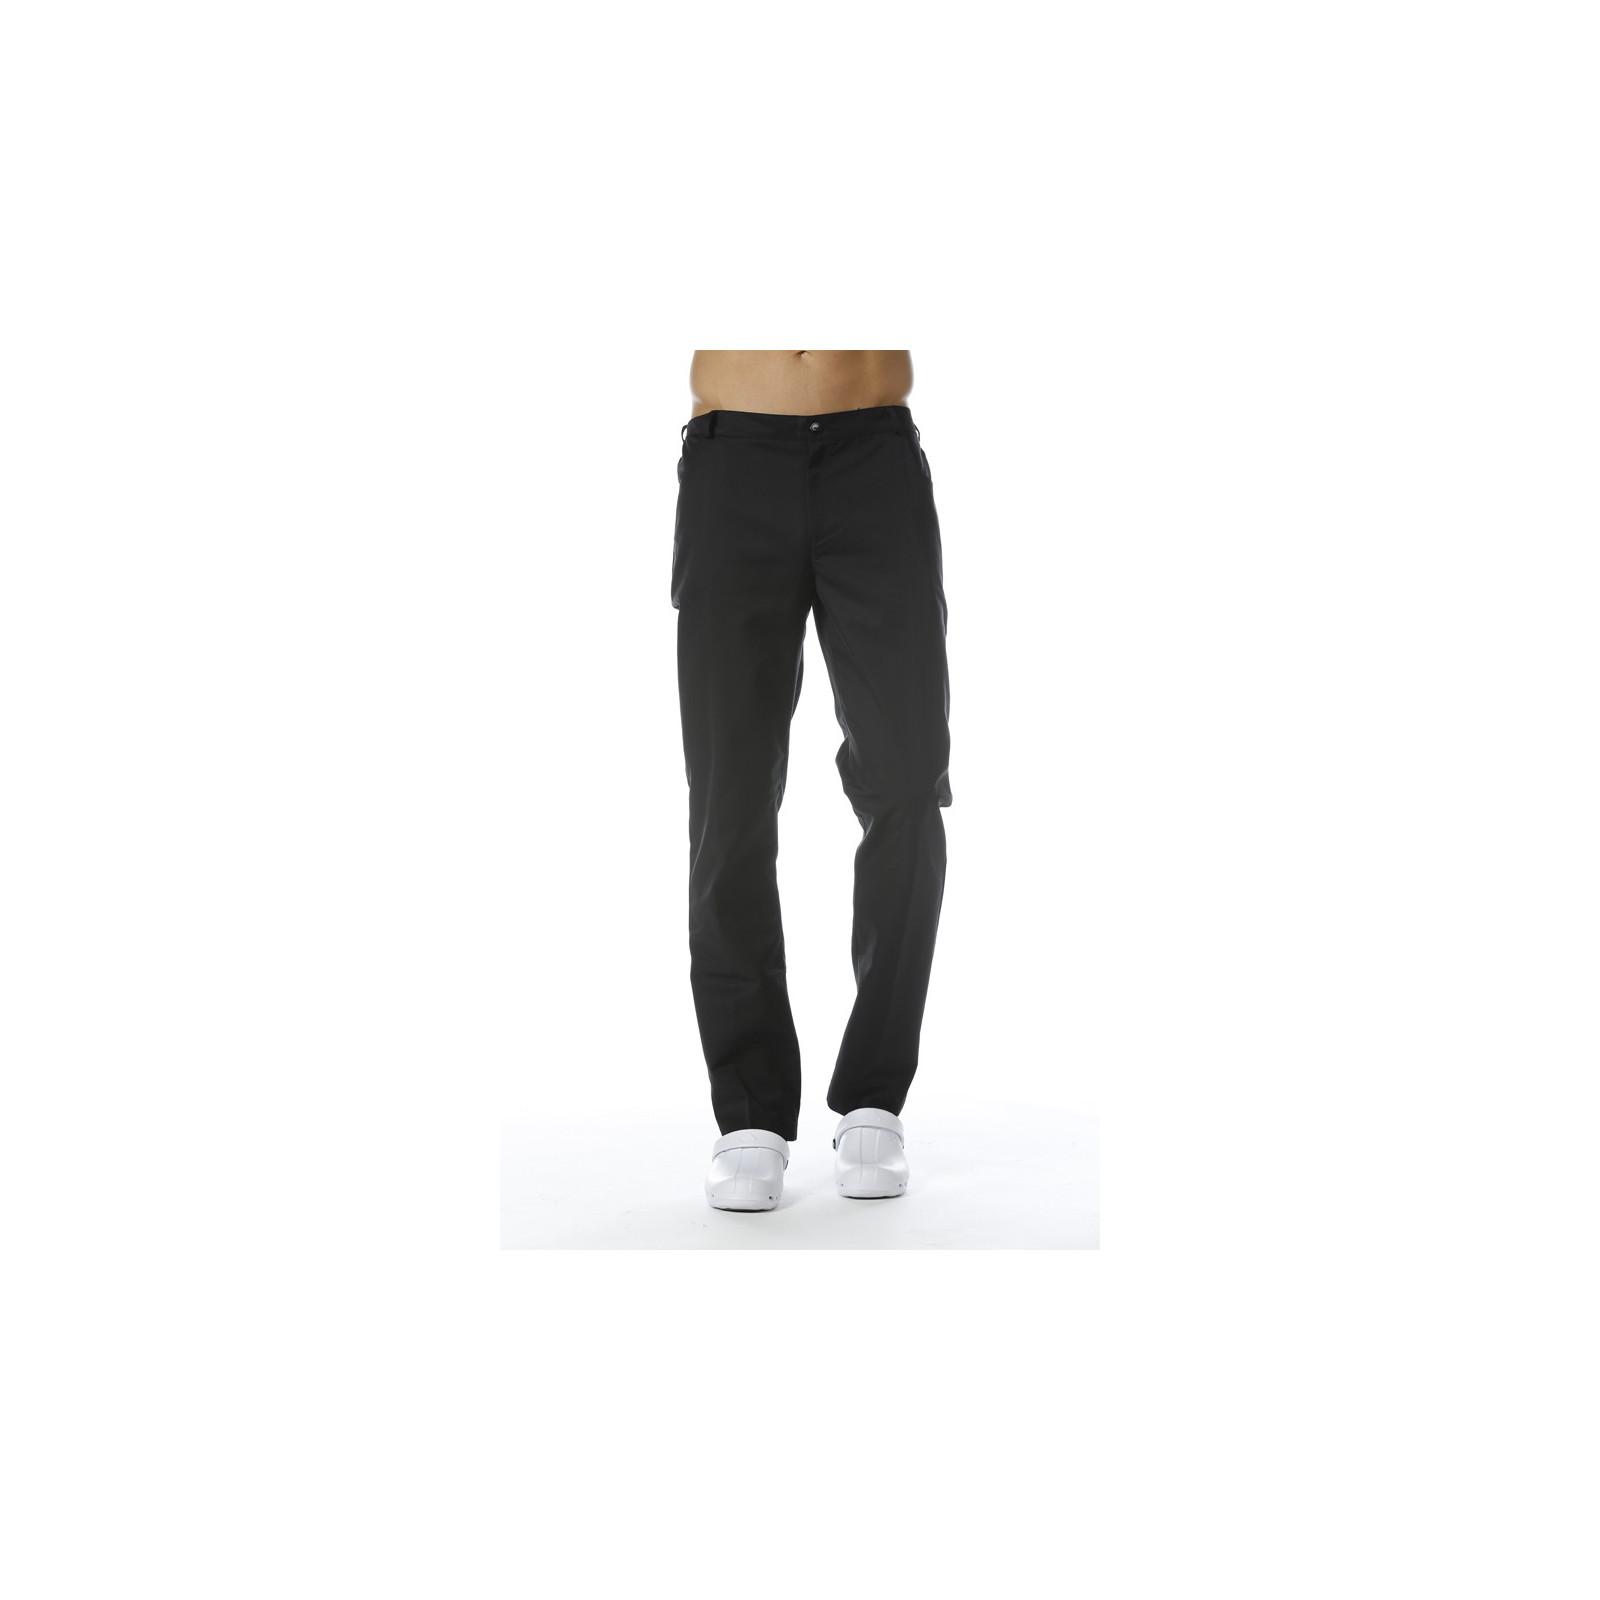 Pantalon médical MANKAIA, 228